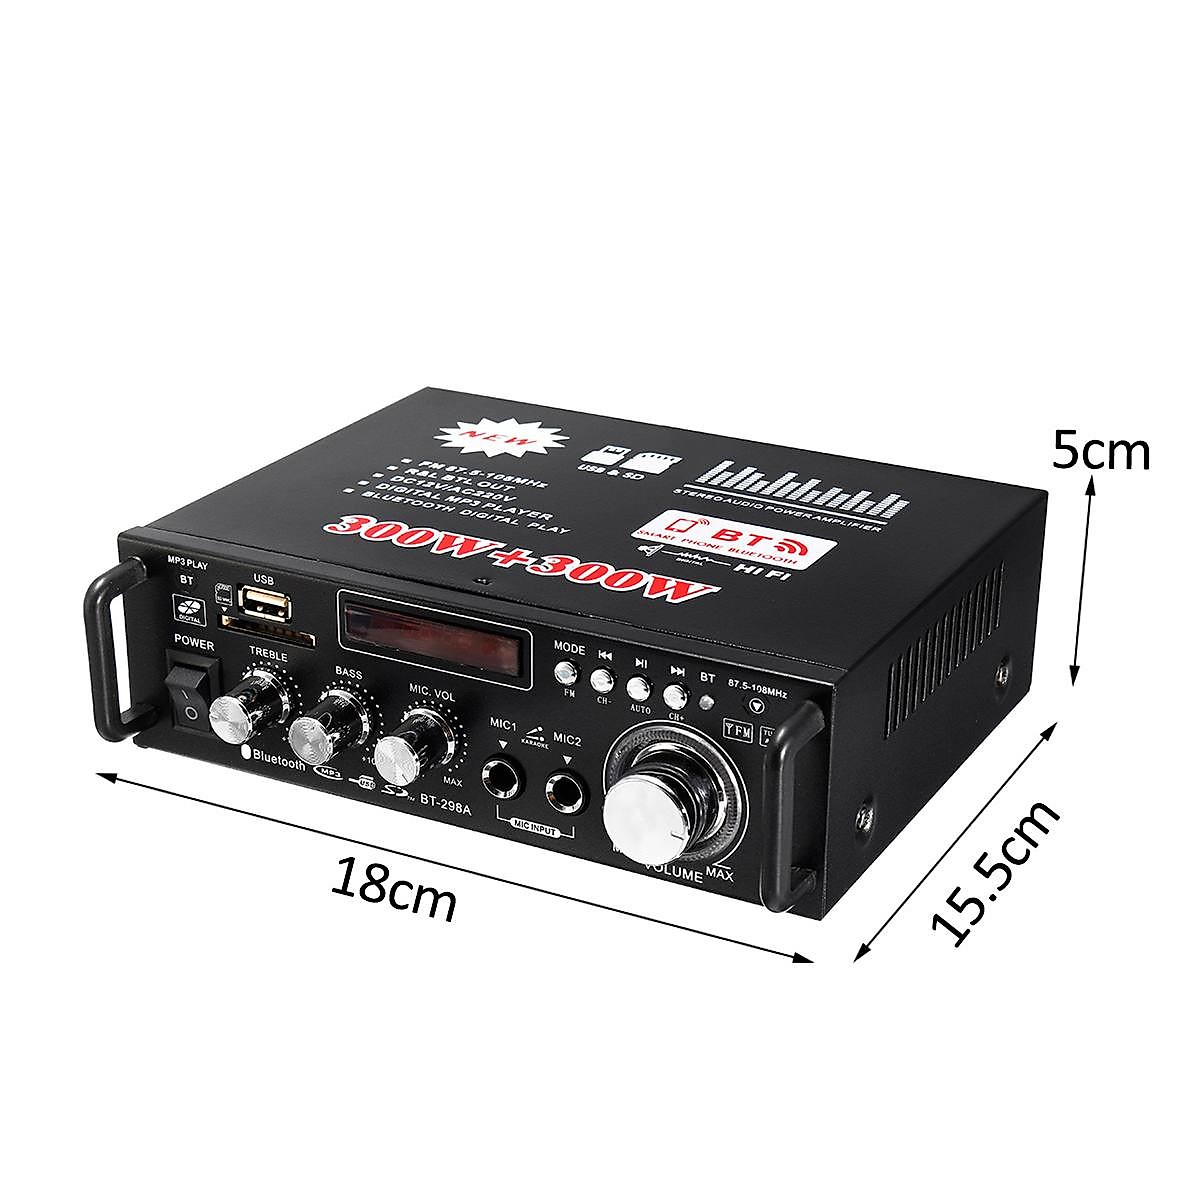 Ampli Bluetooth DAC BT-298A